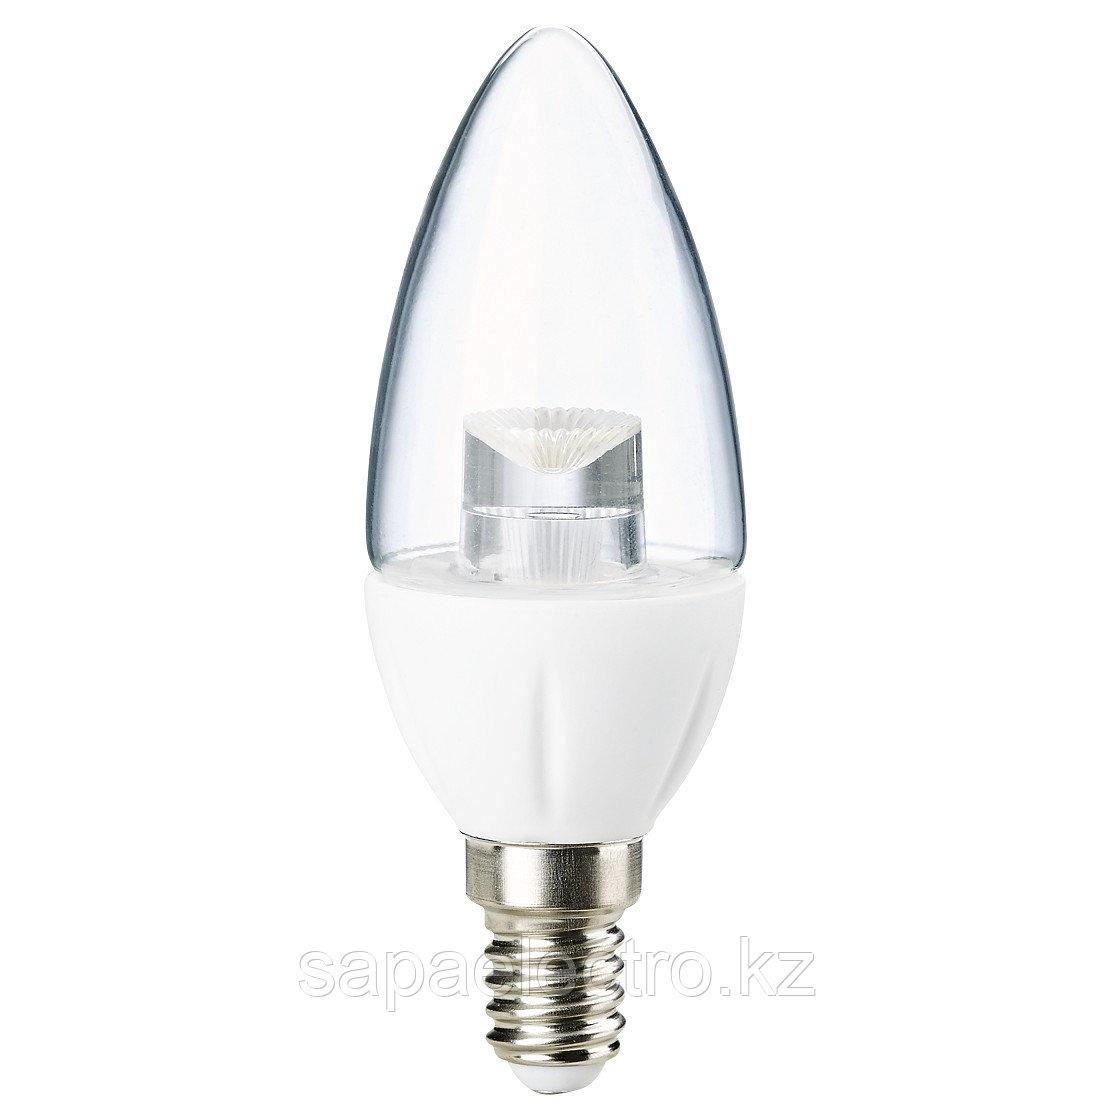 Лампа LED Crystal C37 5W 450LM E14 6000K (TL)100шт